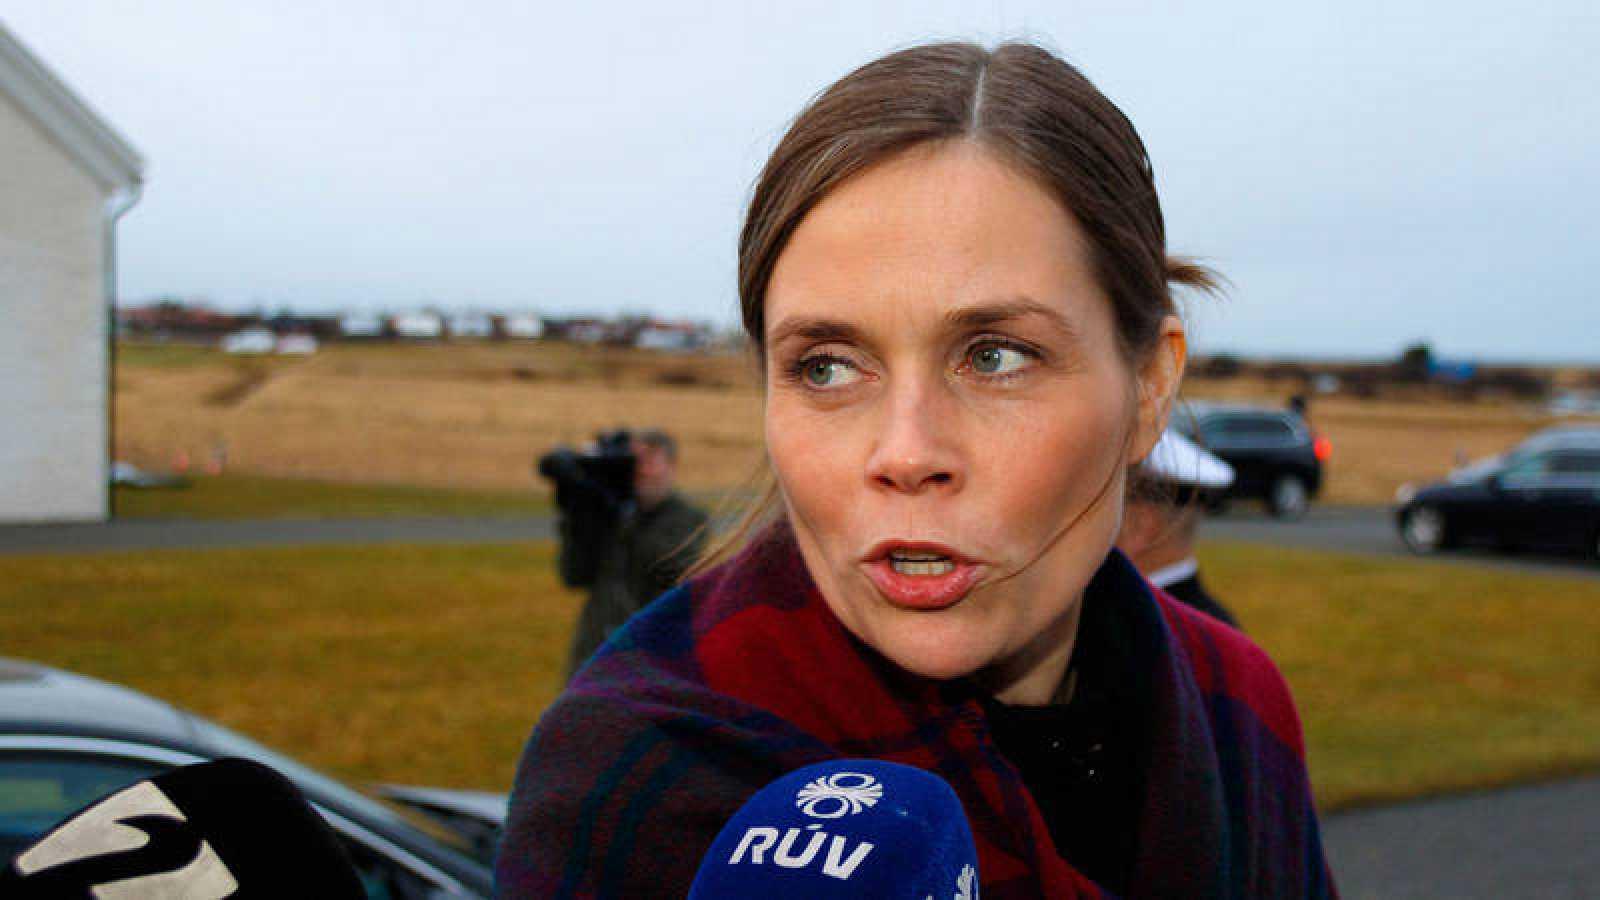 La primera ministra de Islandia, Katrín Jakobsdóttir